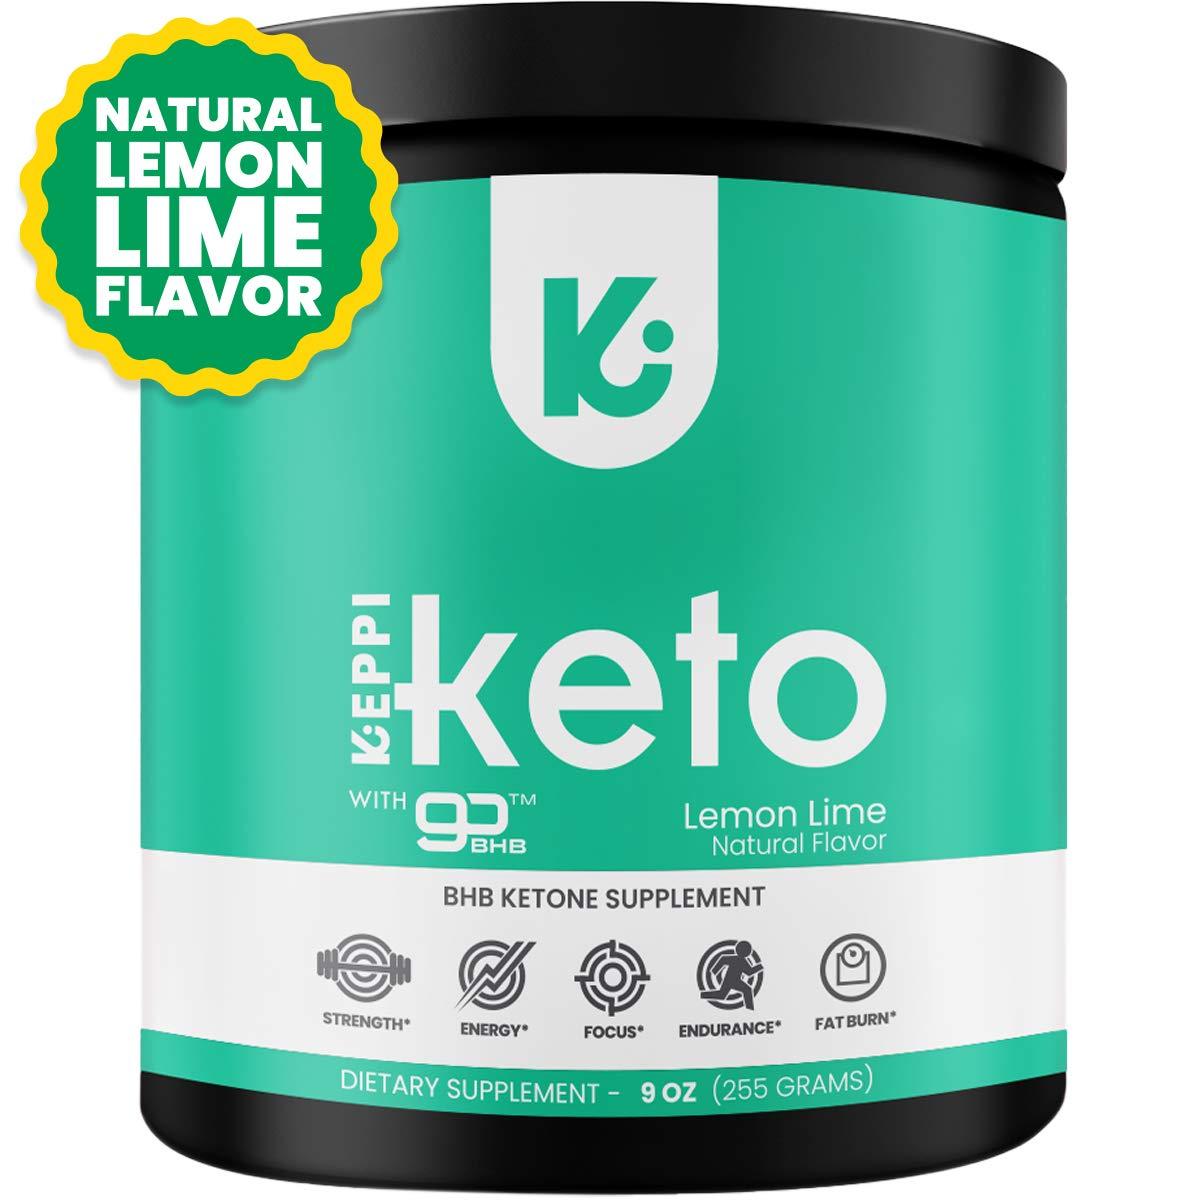 KEPPI Keto BHB Exogenous Ketones Powder Supplement: Patented BHB Ketones Formulated to Increase Energy, Burn Fat, Maintain Ketosis and Mental Focus by Keppi